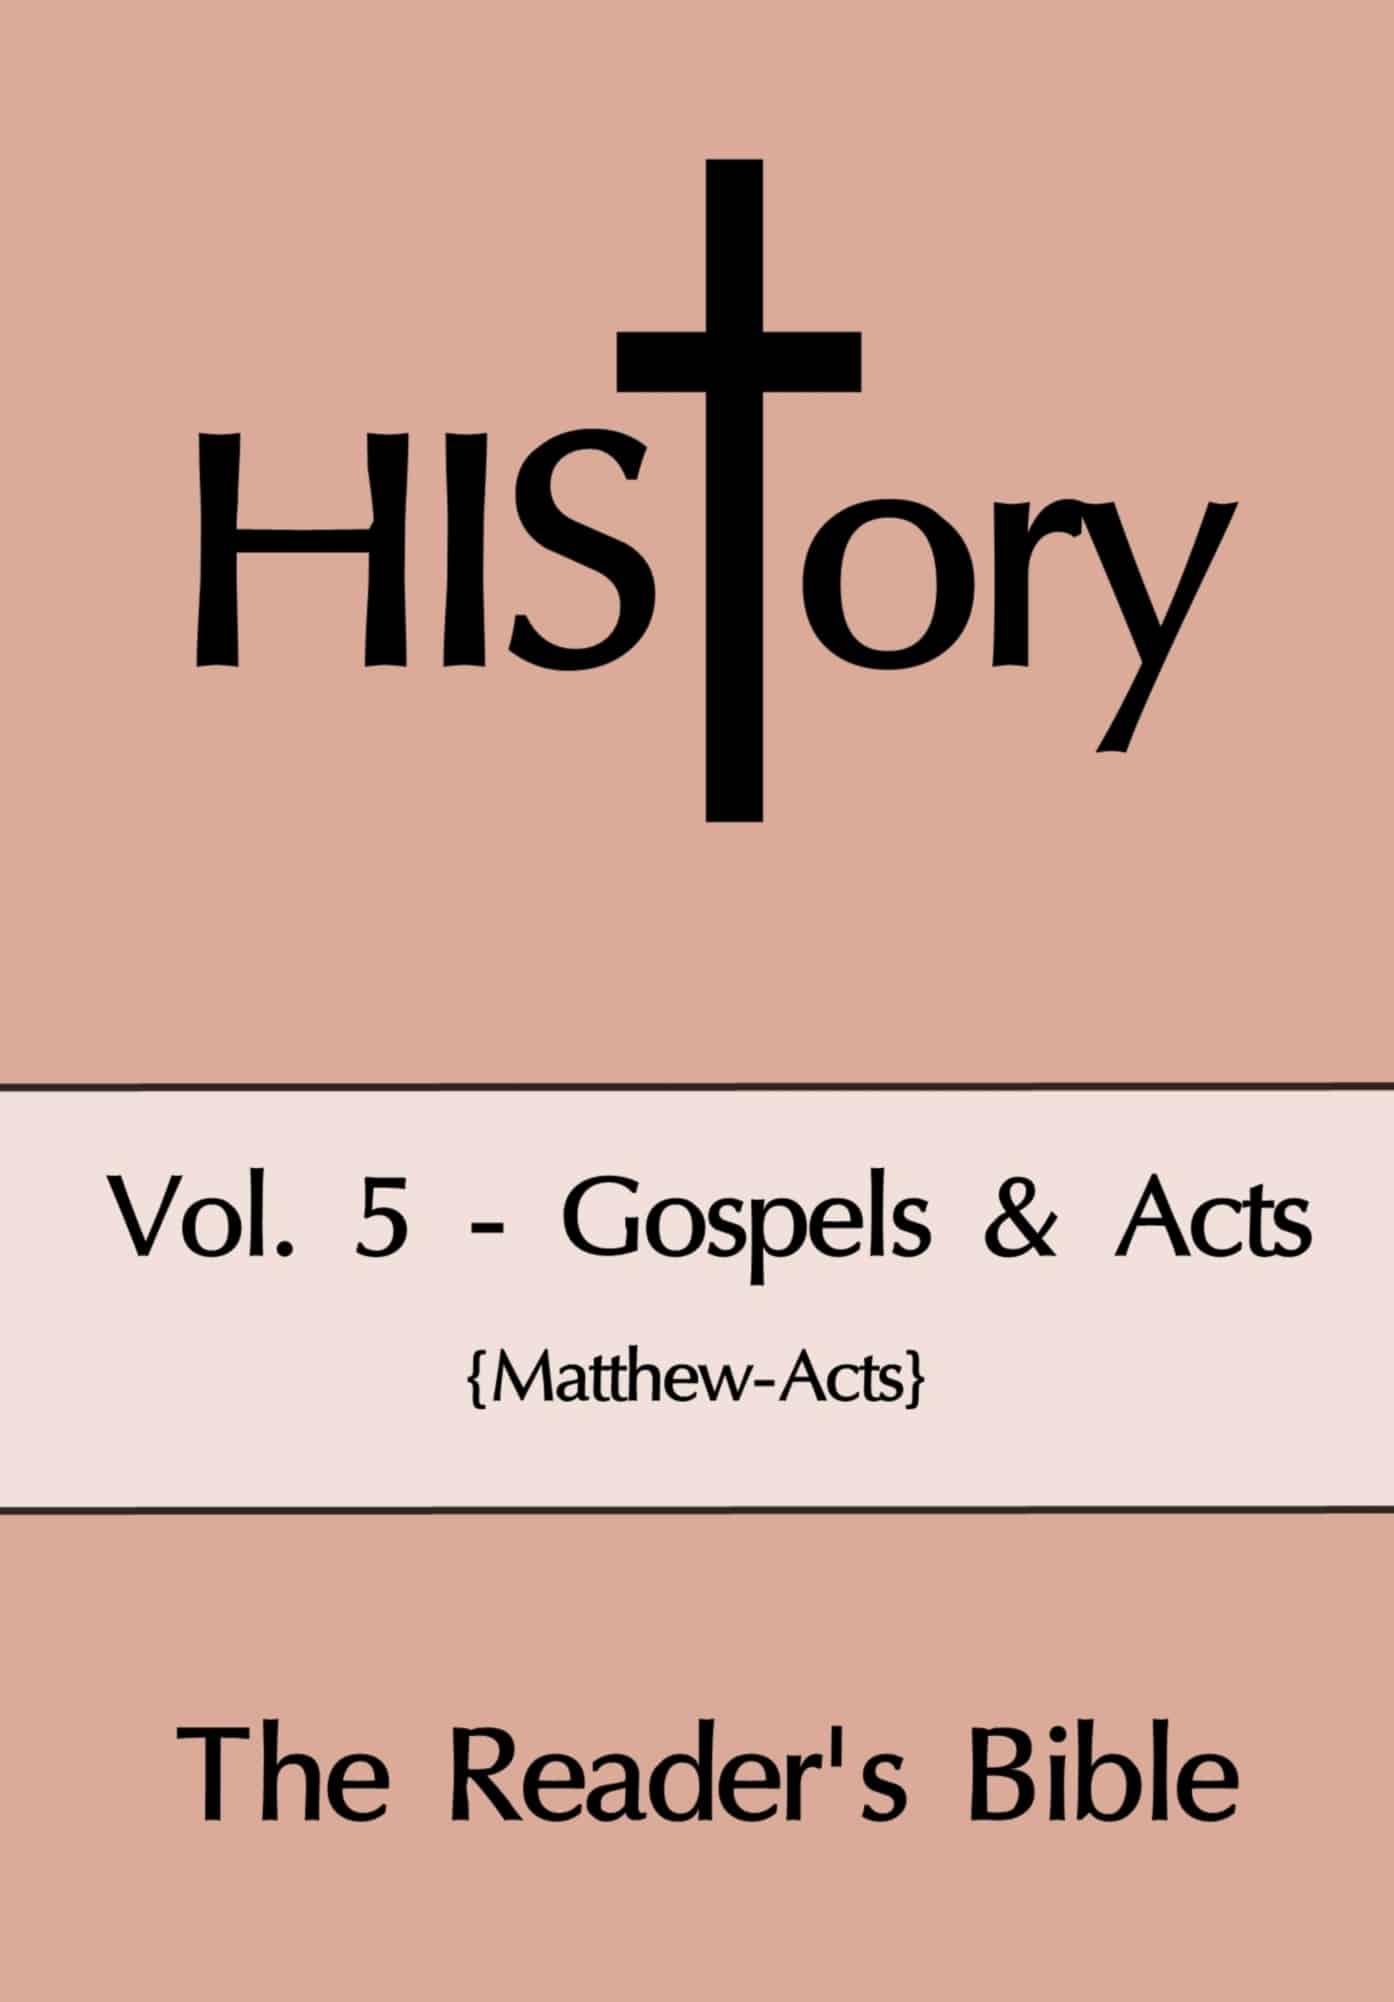 HIStory: The Reader's Bible Vol. 5 {Gospels & Acts}